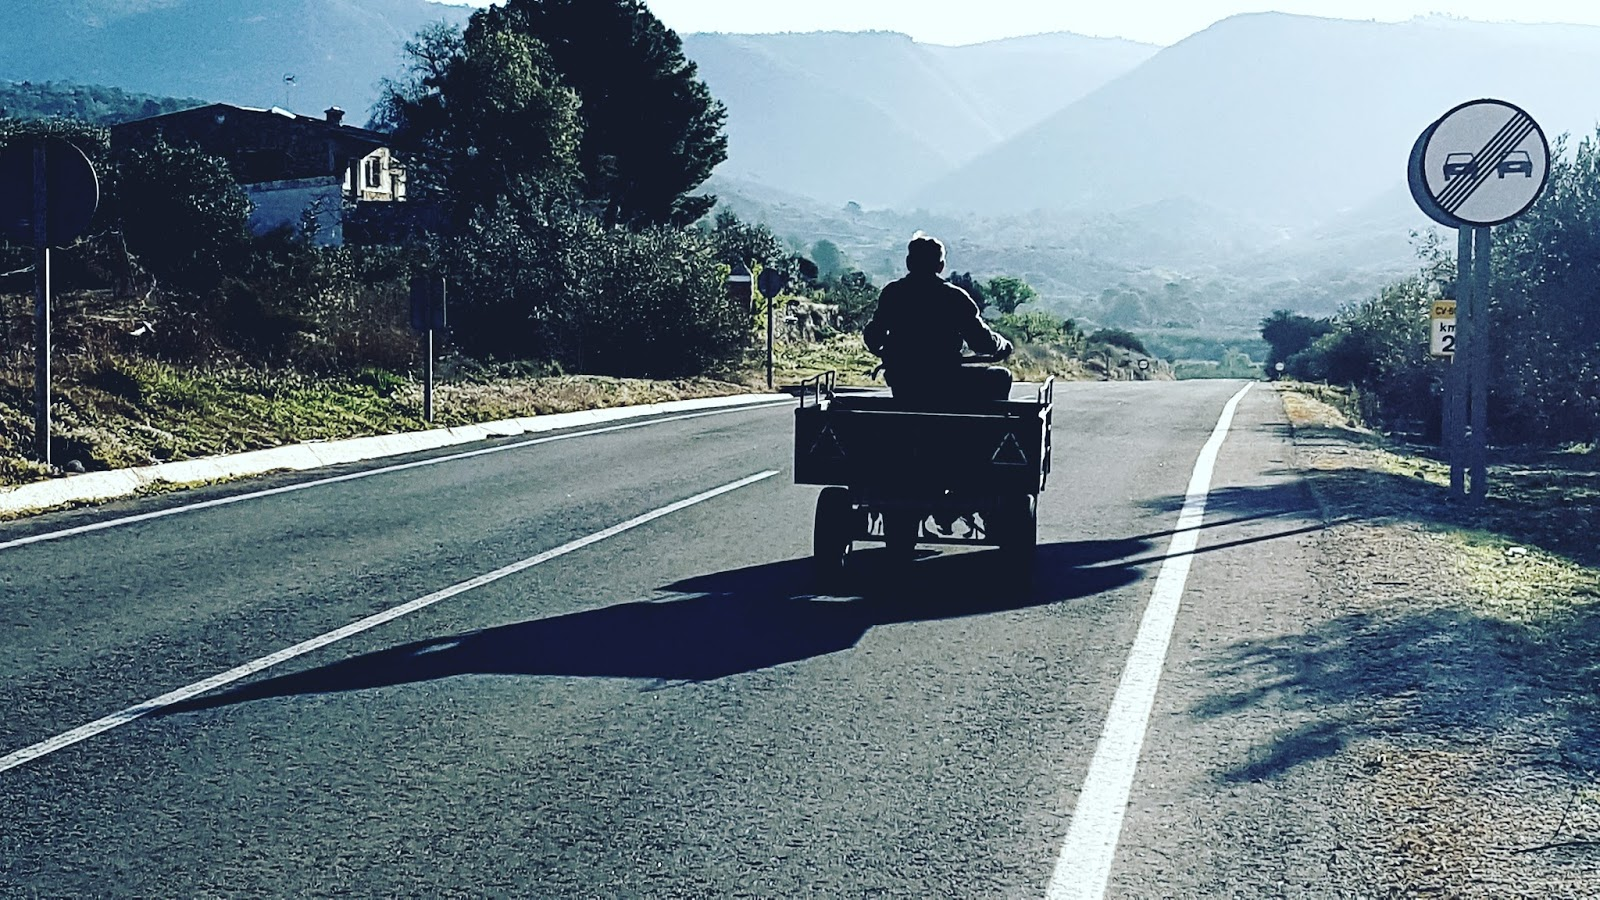 Cycling in Valencia - Vall d'Albaida, Valencia